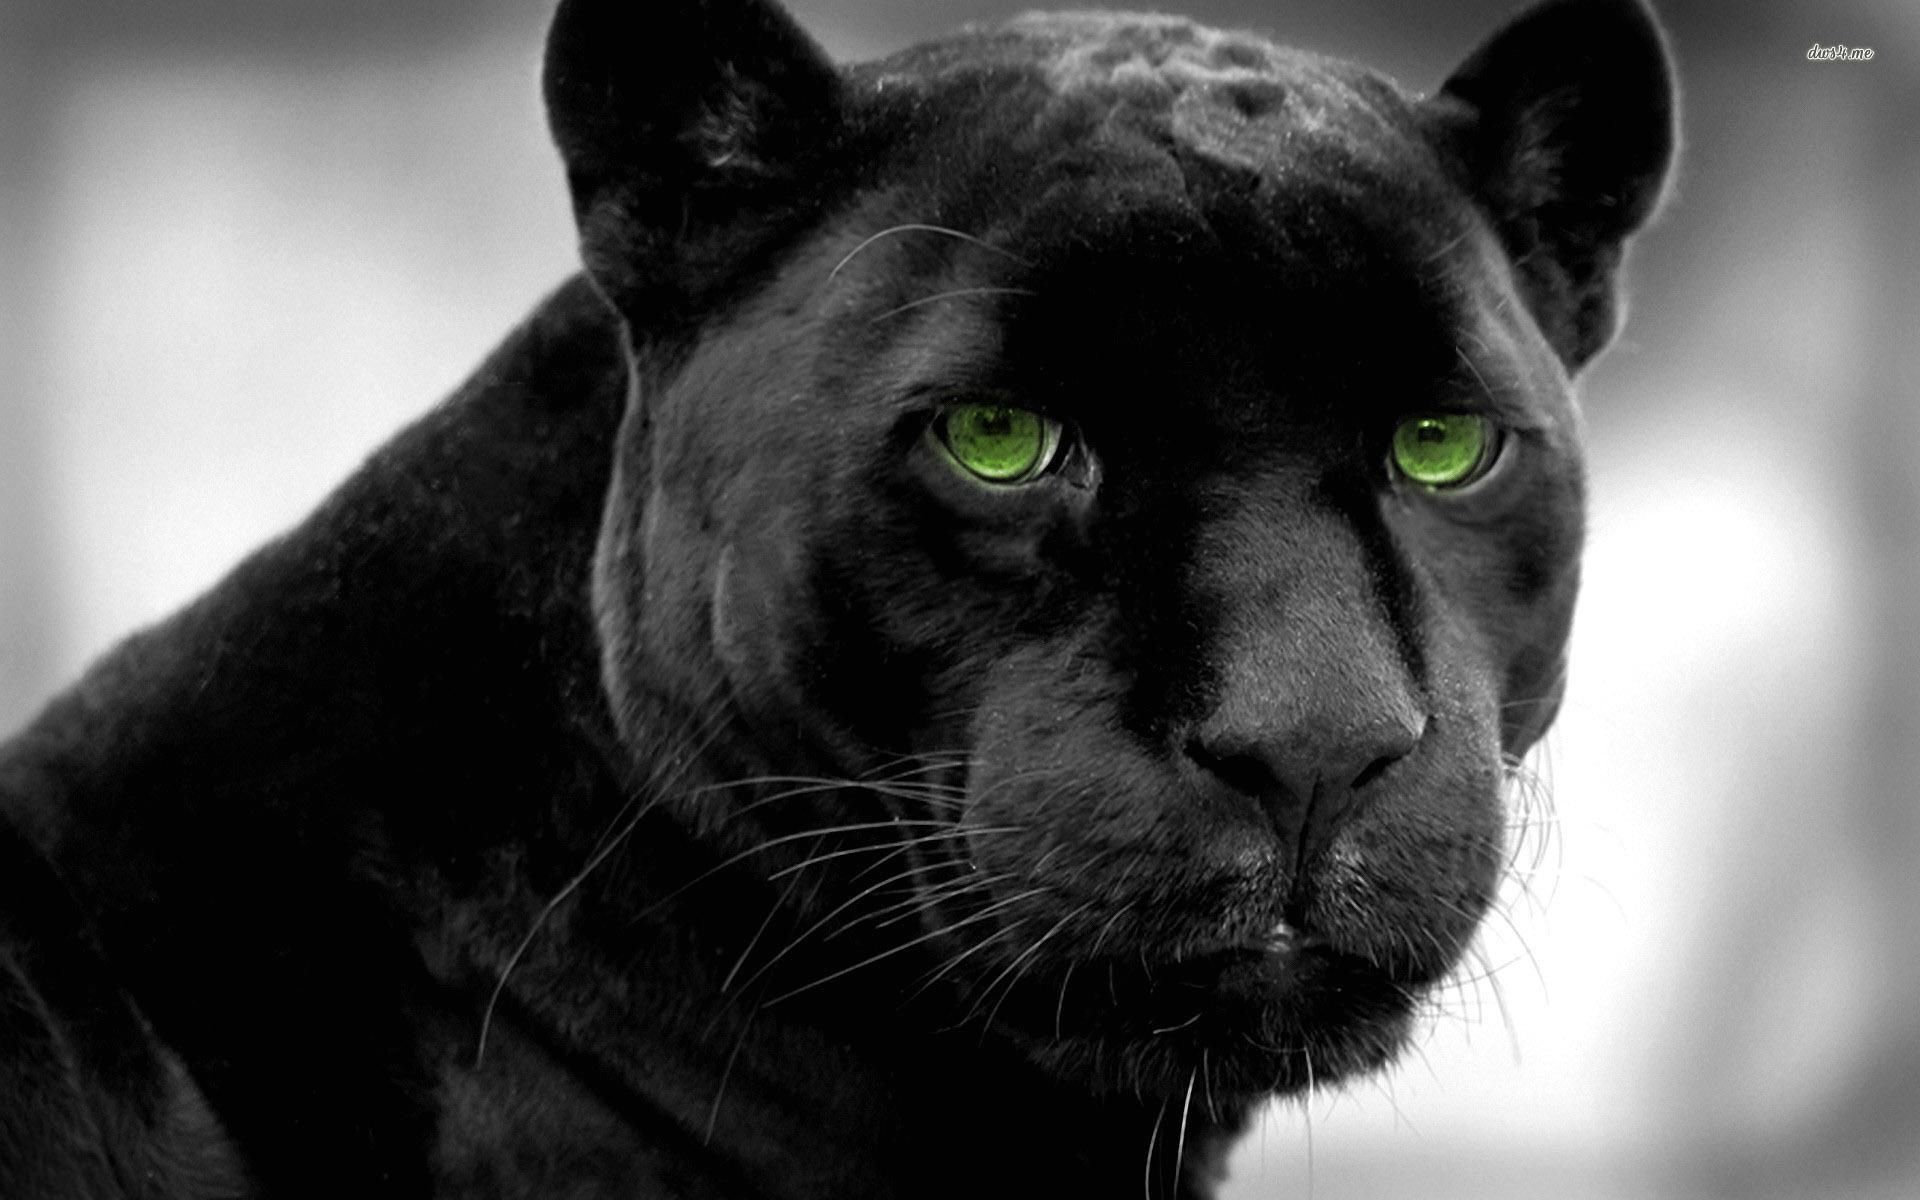 Wallpaper Black Panther   1920 x 1200   Animals Pets 1920x1200